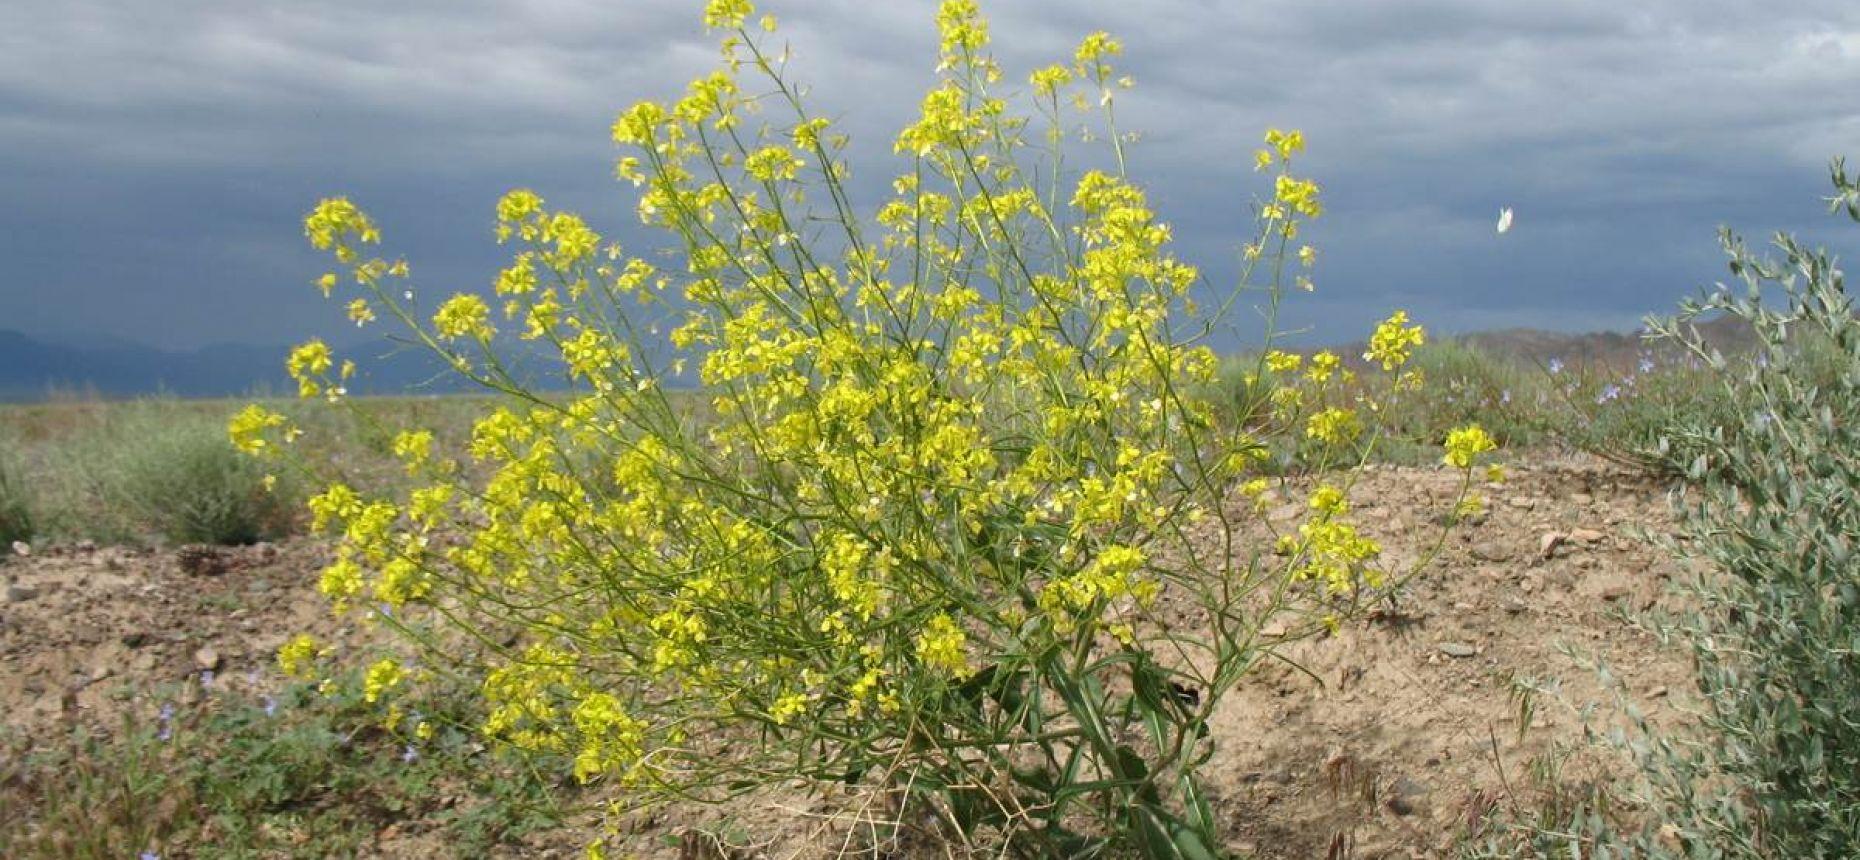 Erucastrum armoracioides (Czern. ex Turcz.) Cruchet. - Рогачка хреновидная